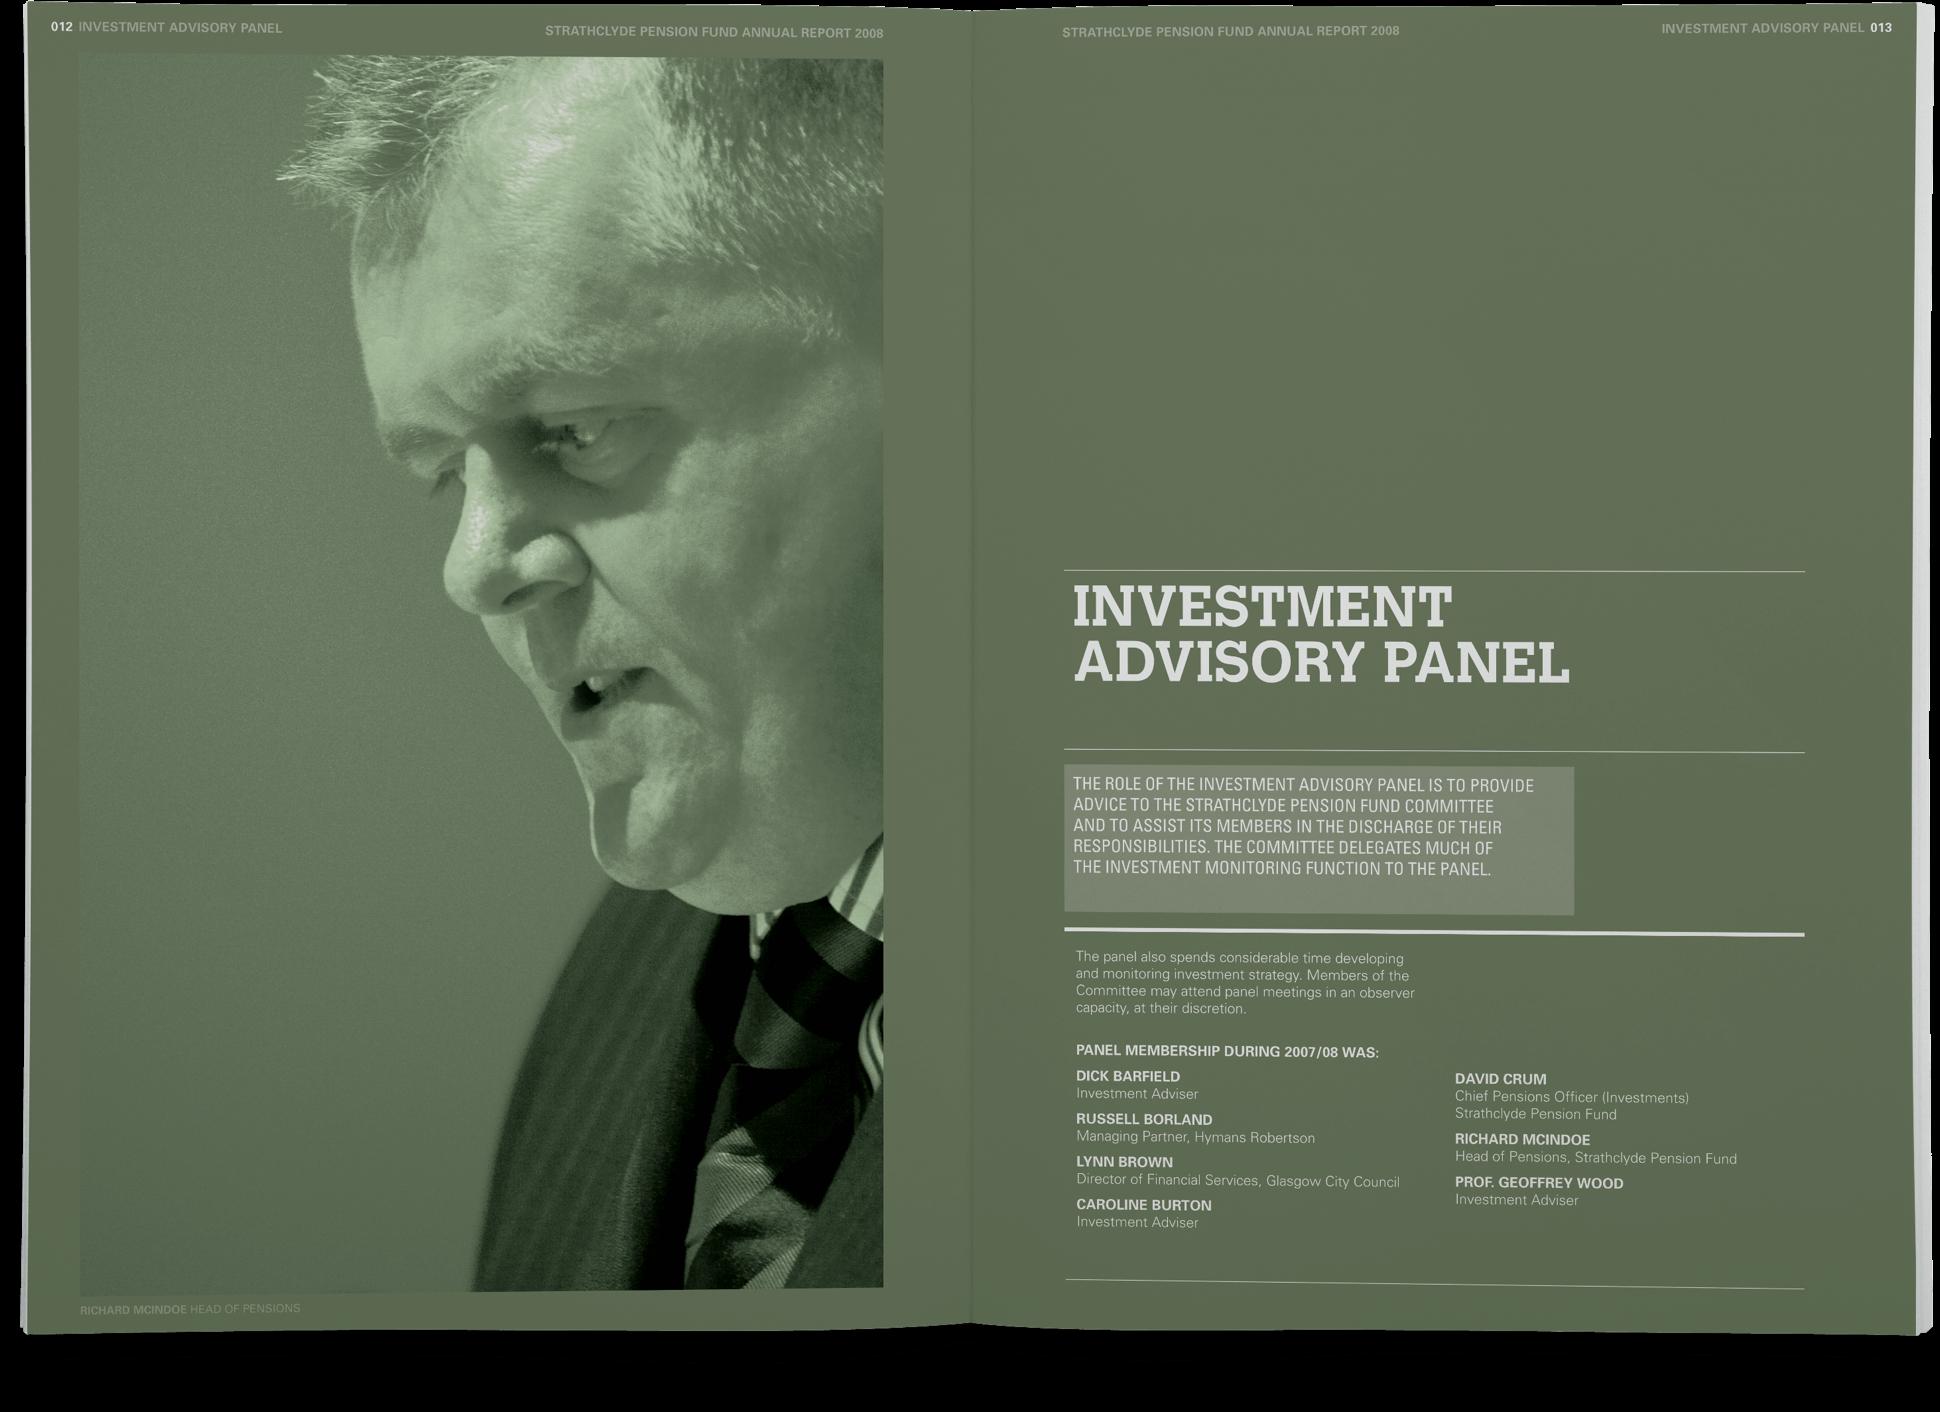 SPF Investment Adv Panel@2x